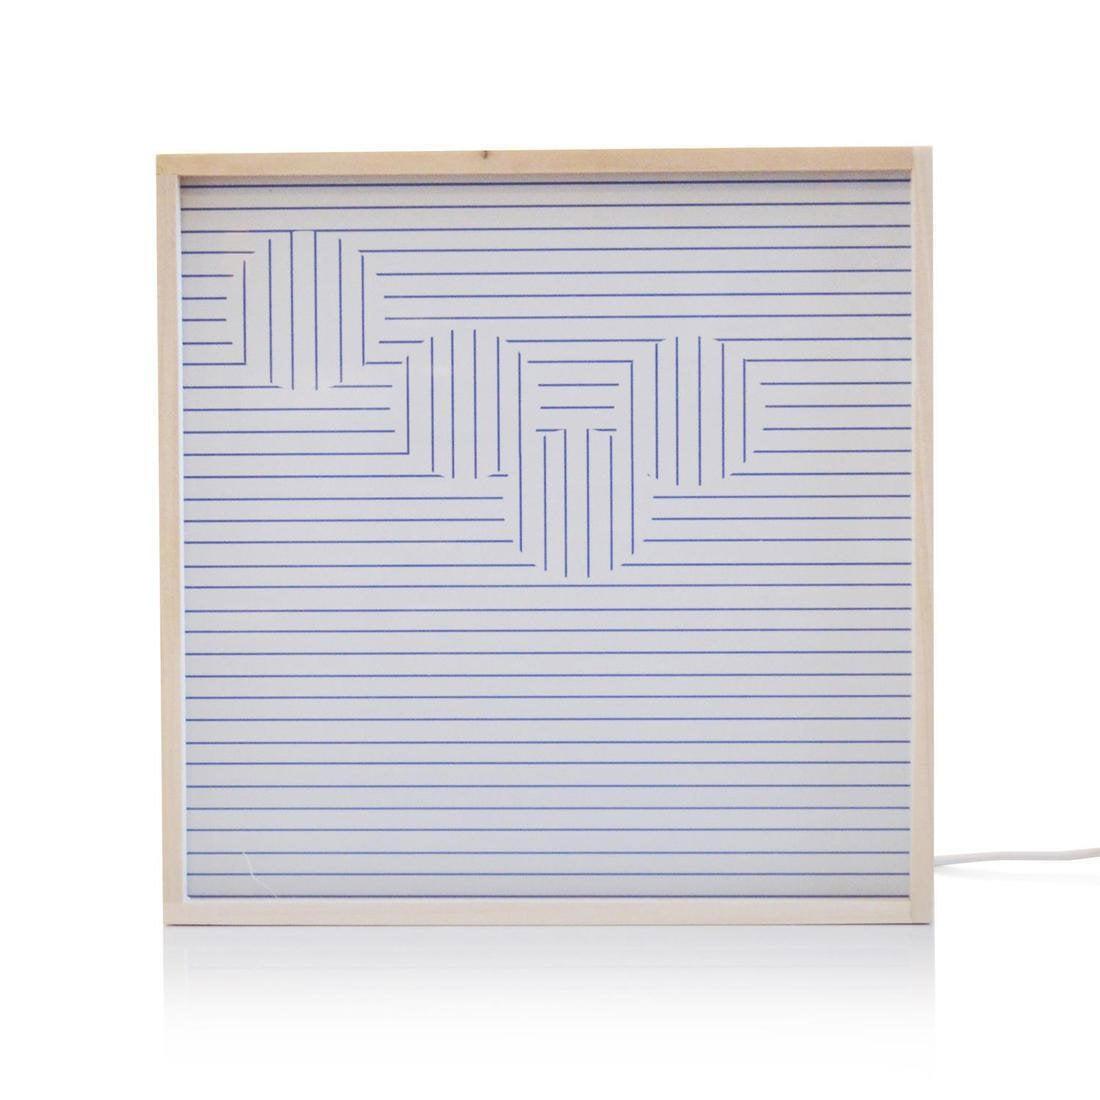 Boîte lumineuse, led intégrée Stand out DADA LIGHT, blanc et bleu, 9.6 W